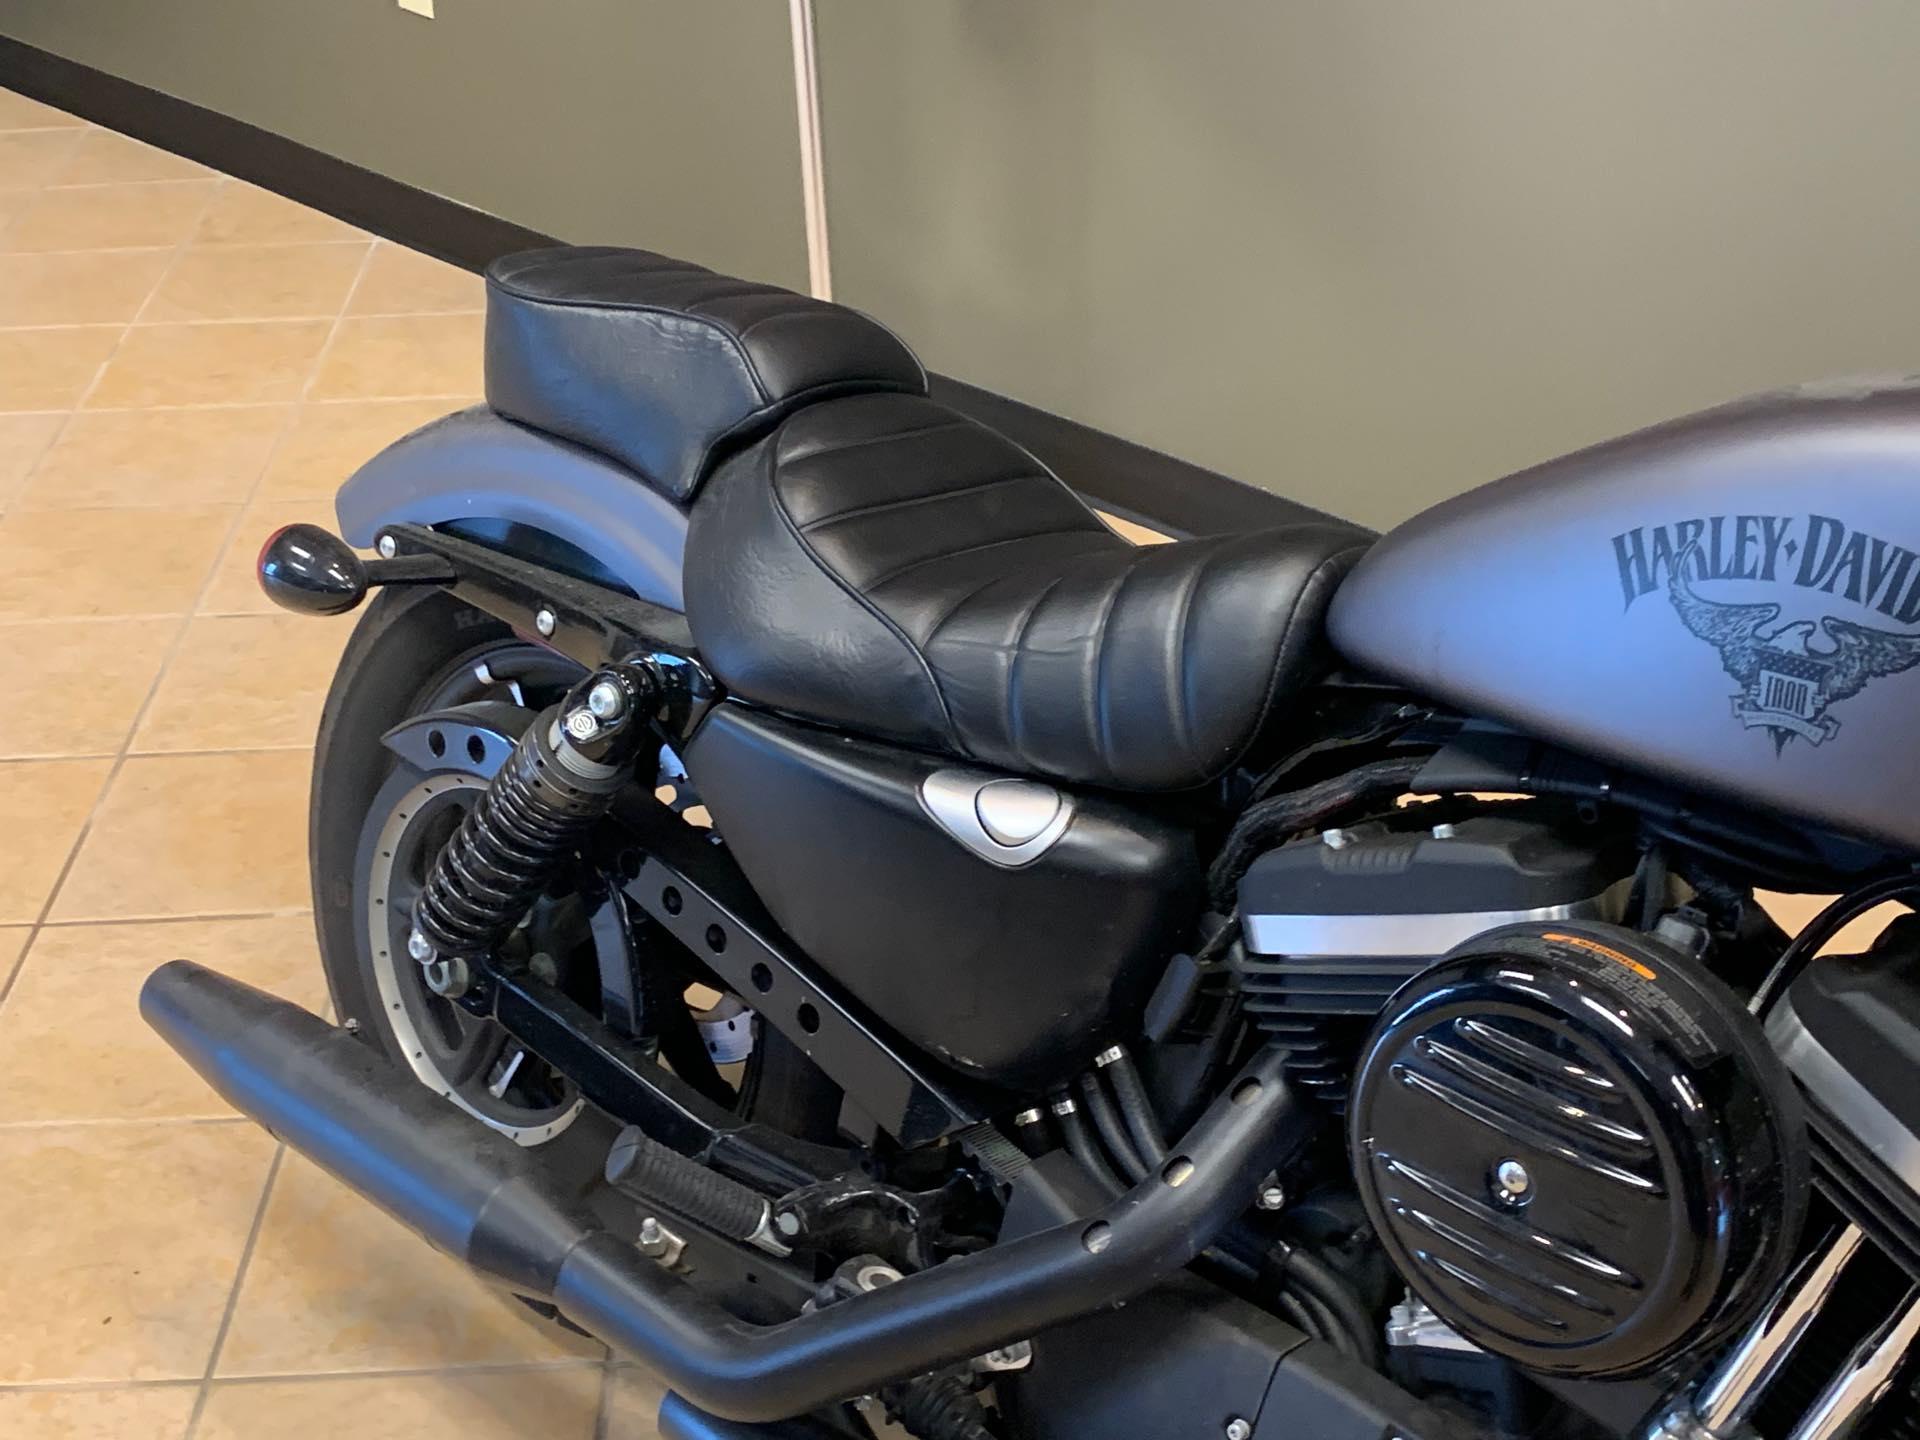 2017 Harley-Davidson Sportster Iron 883 at Loess Hills Harley-Davidson